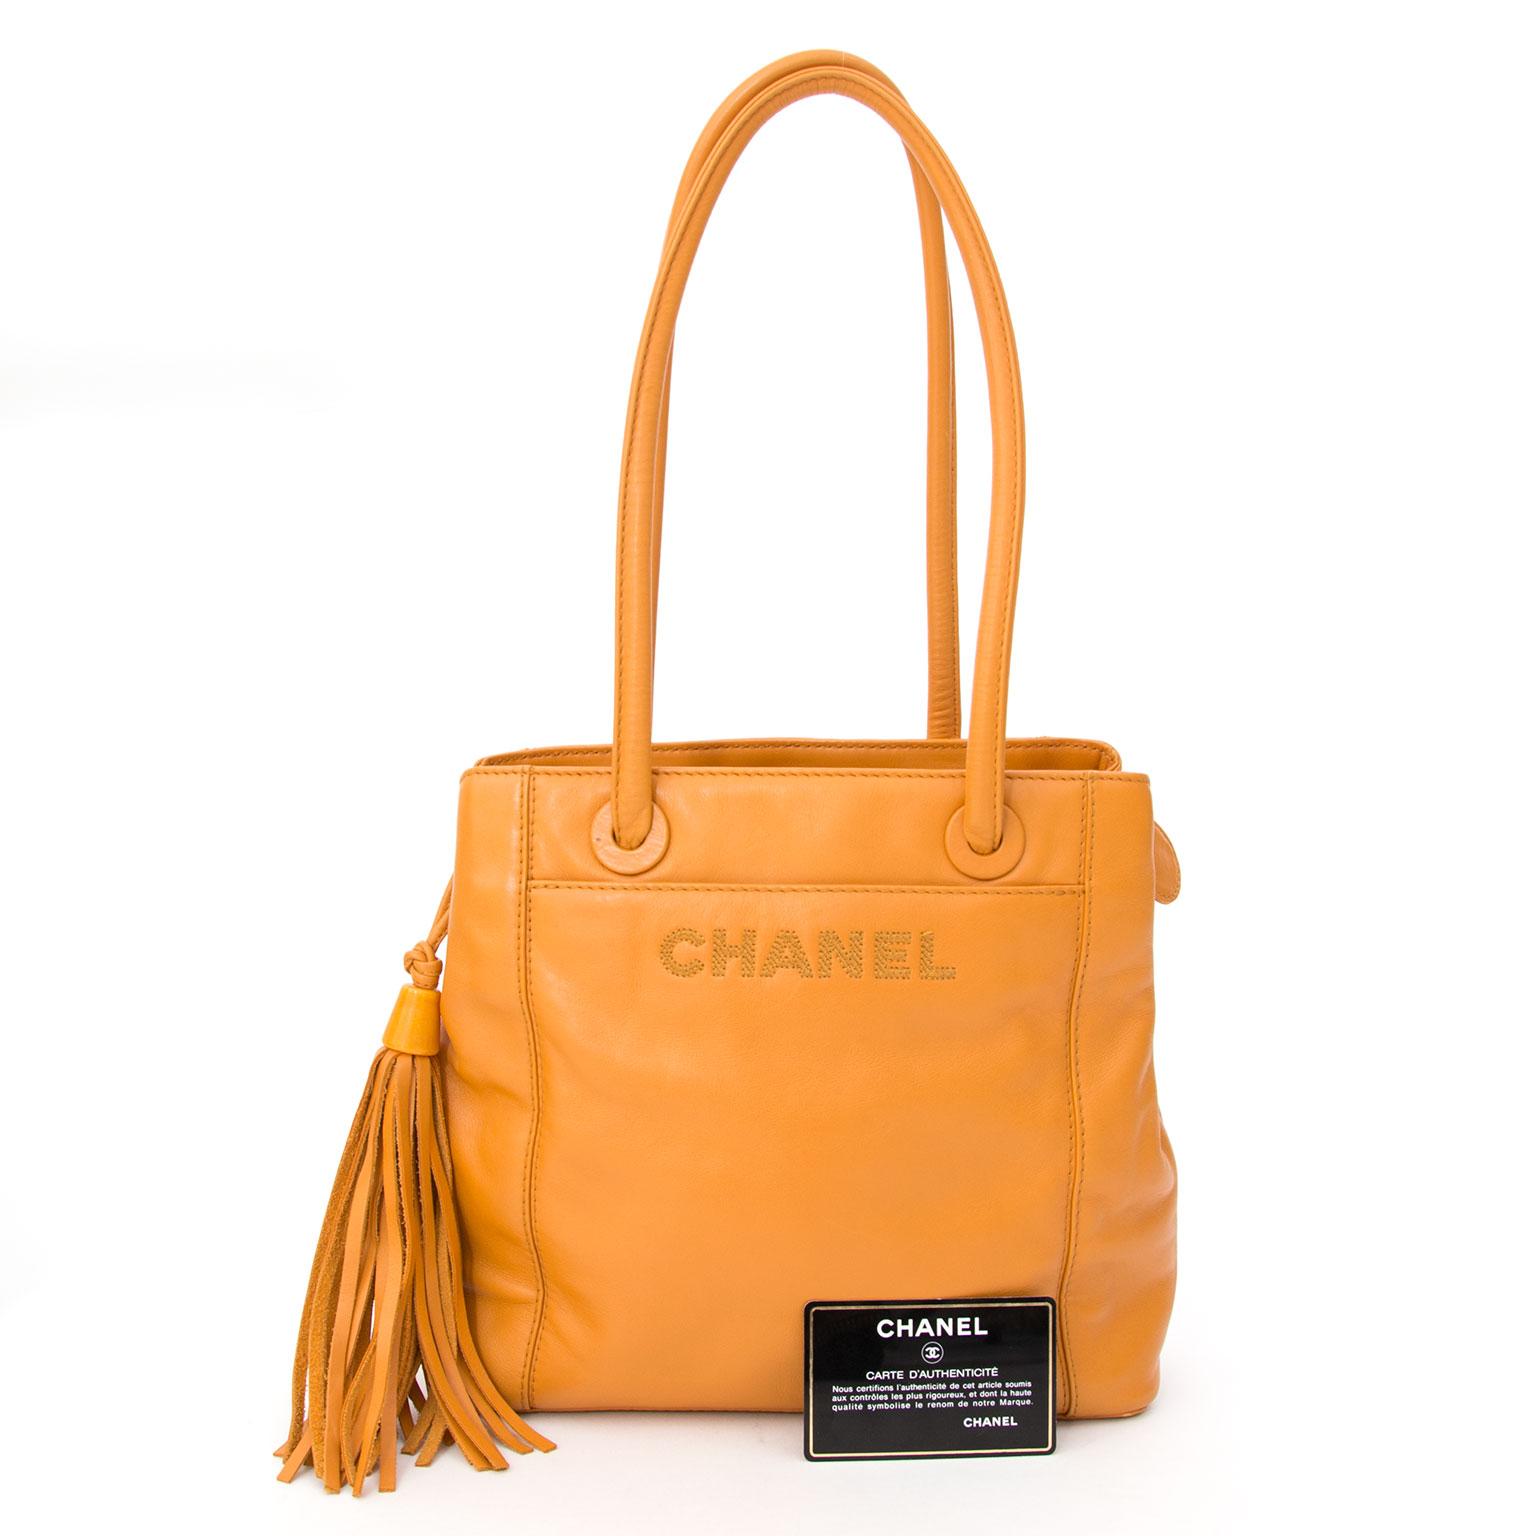 0abe28310c57 Chanel Tassel Handbag Orange. Veilig online winkelen bij LabelLOV vintage  webshop.